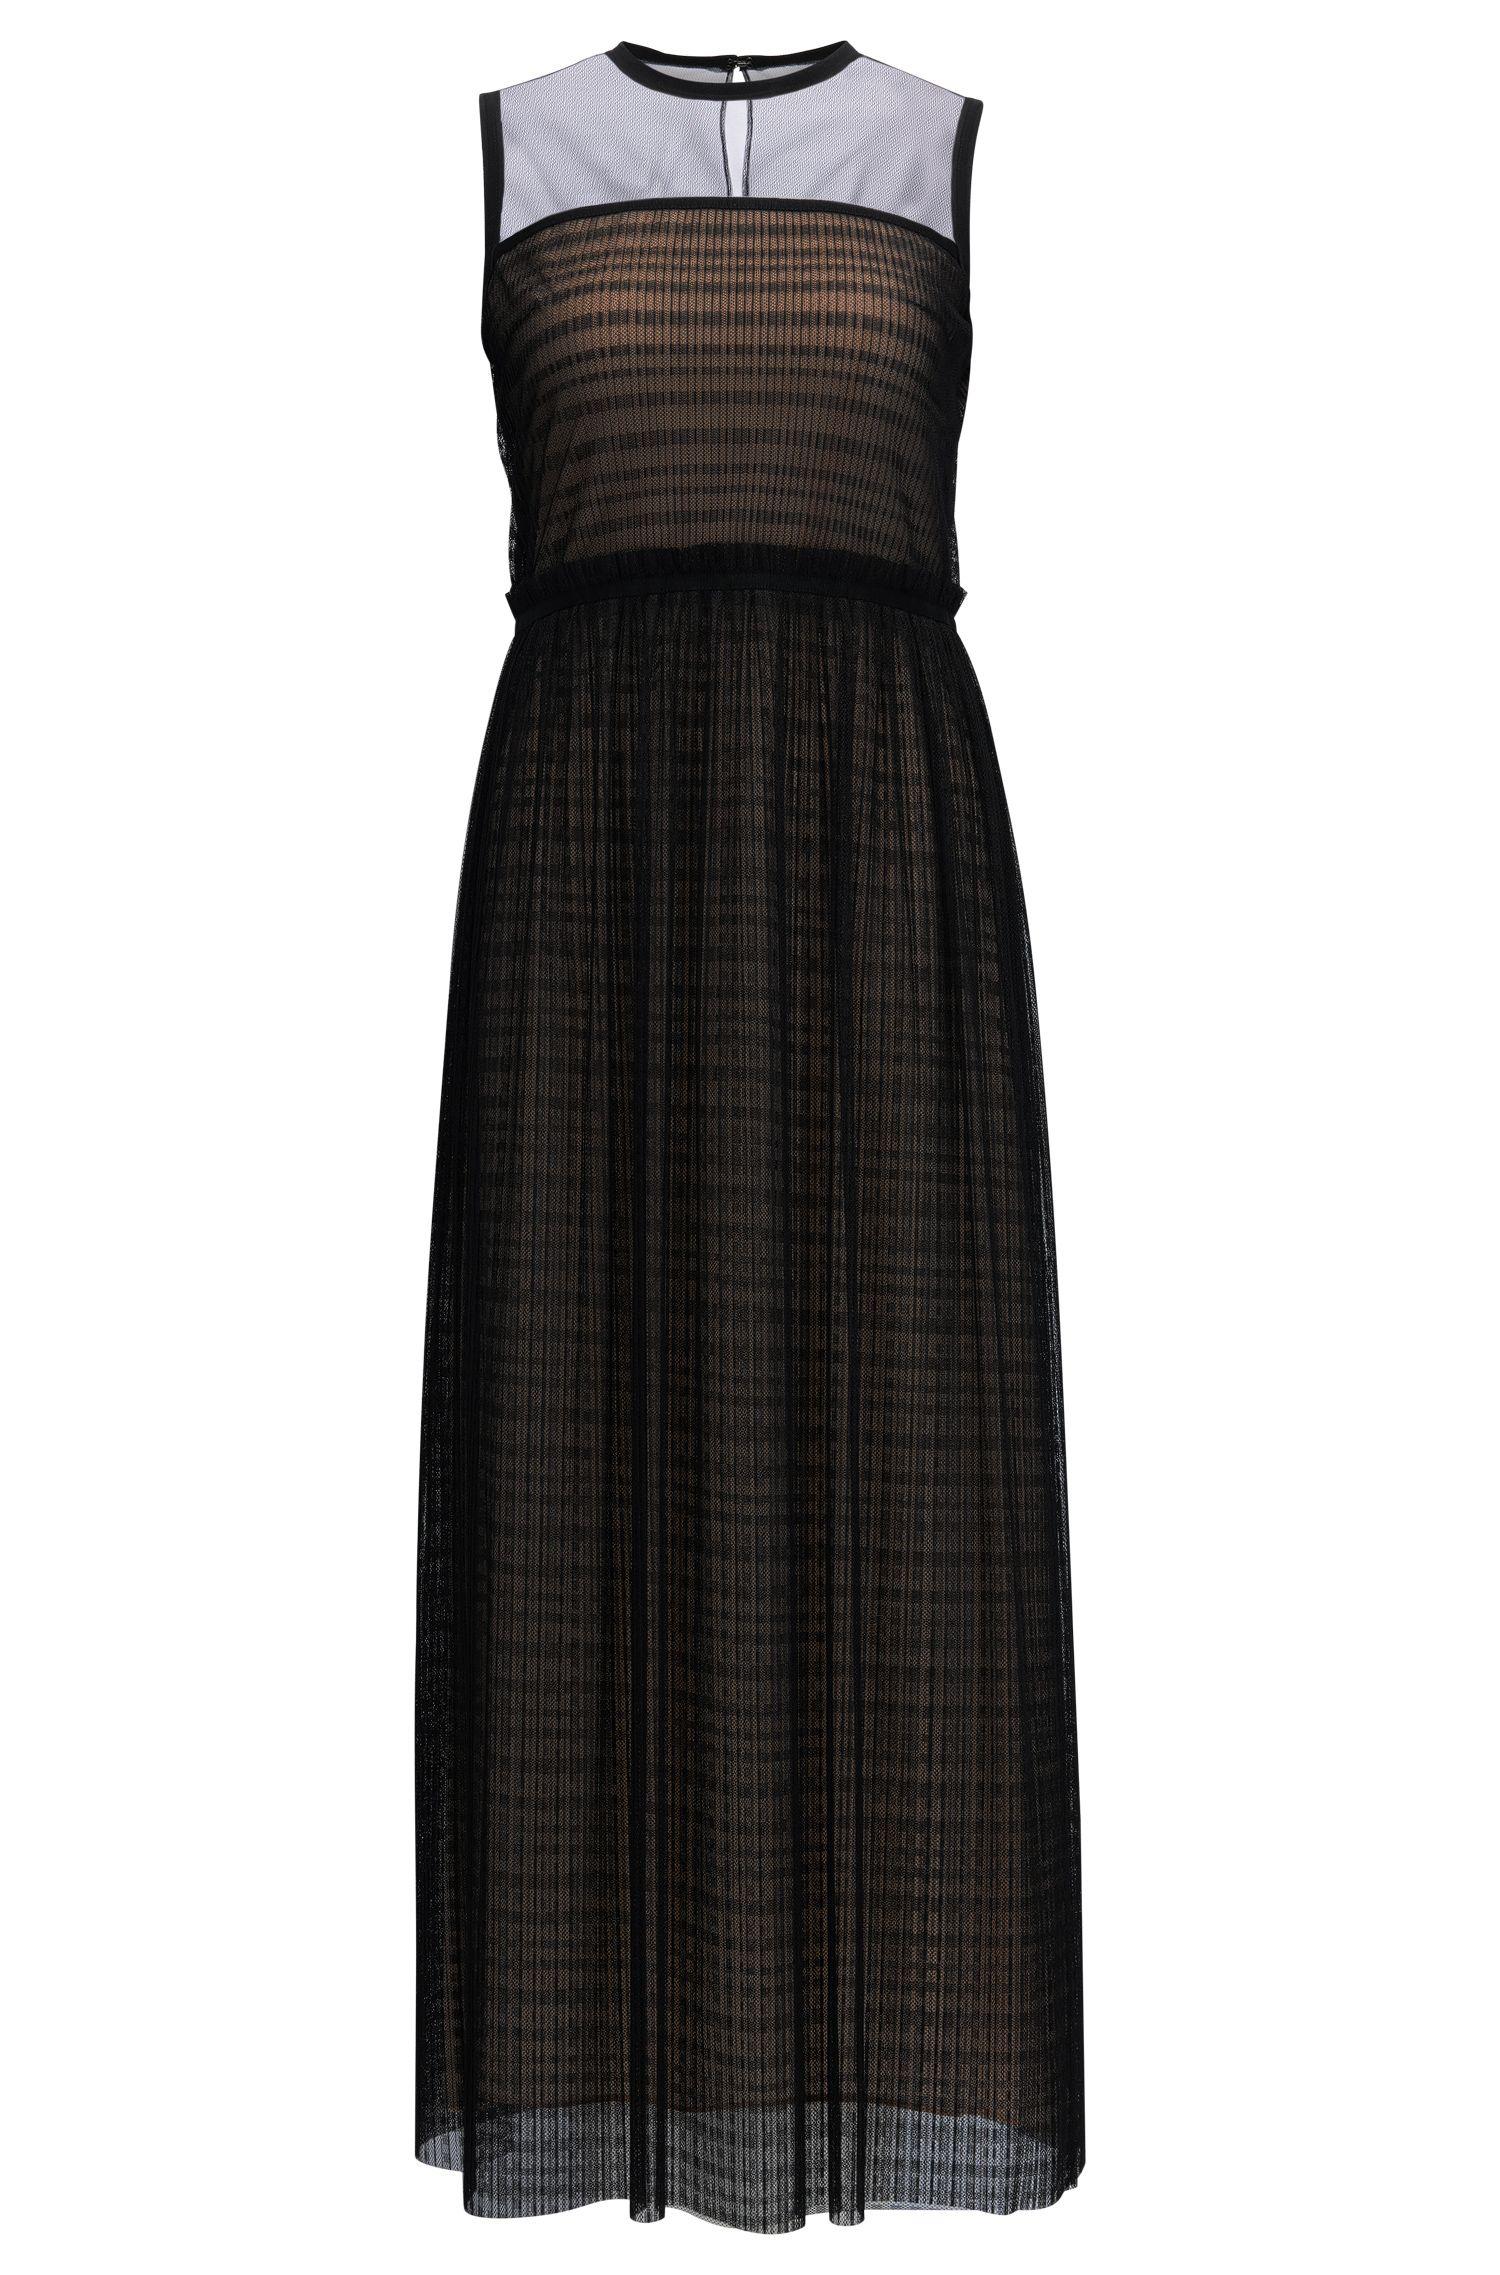 Mouwloze jurk van gelaagd tule